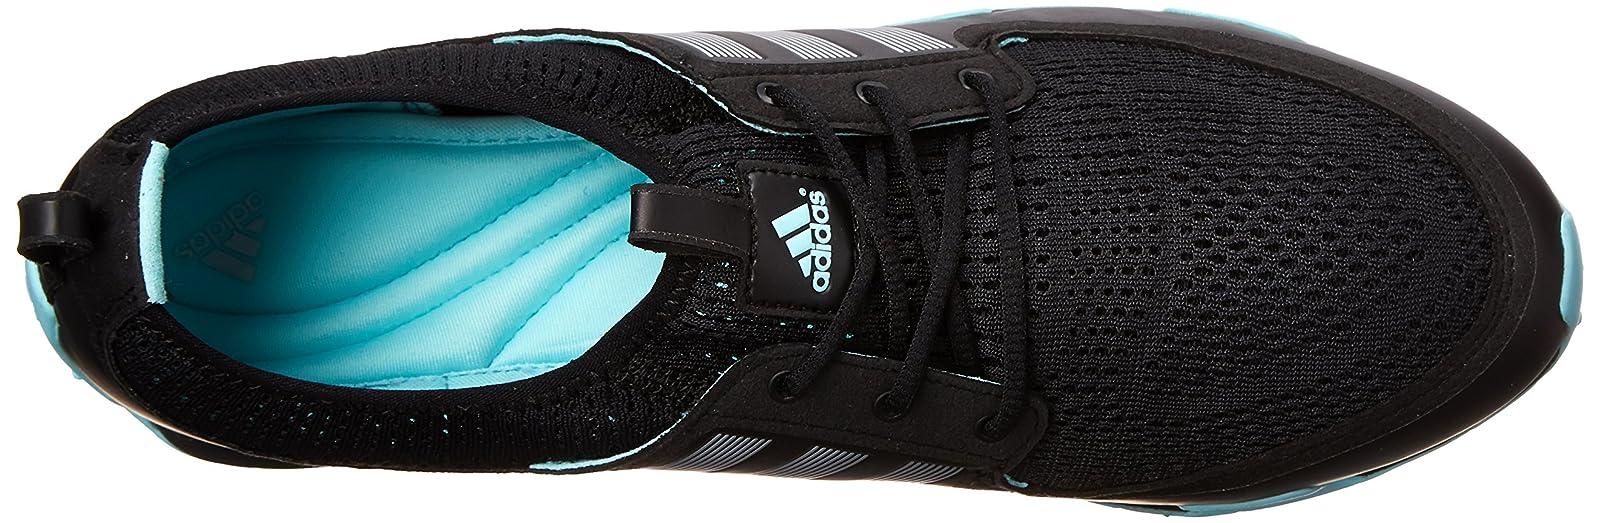 adidas Women's W CC Ballerina II Golf Shoe 13 M US - 8